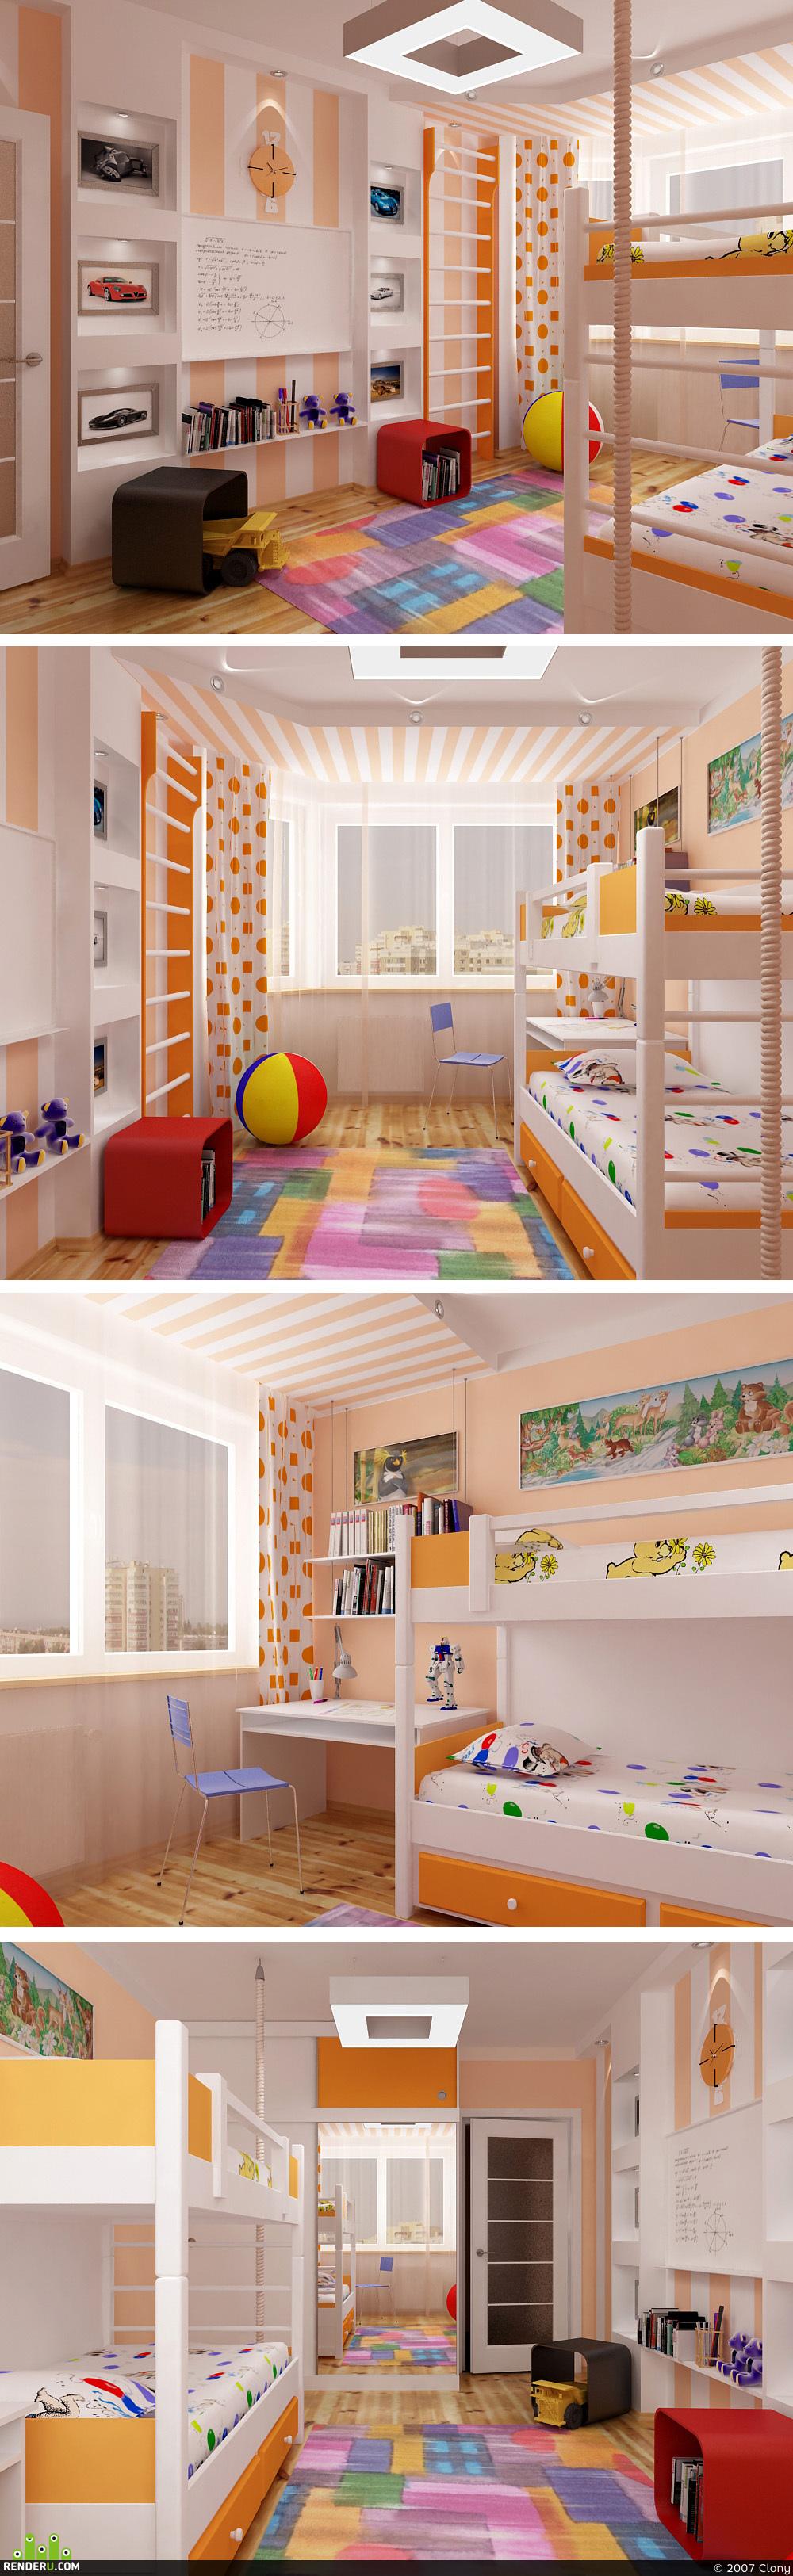 preview комната для моих детей